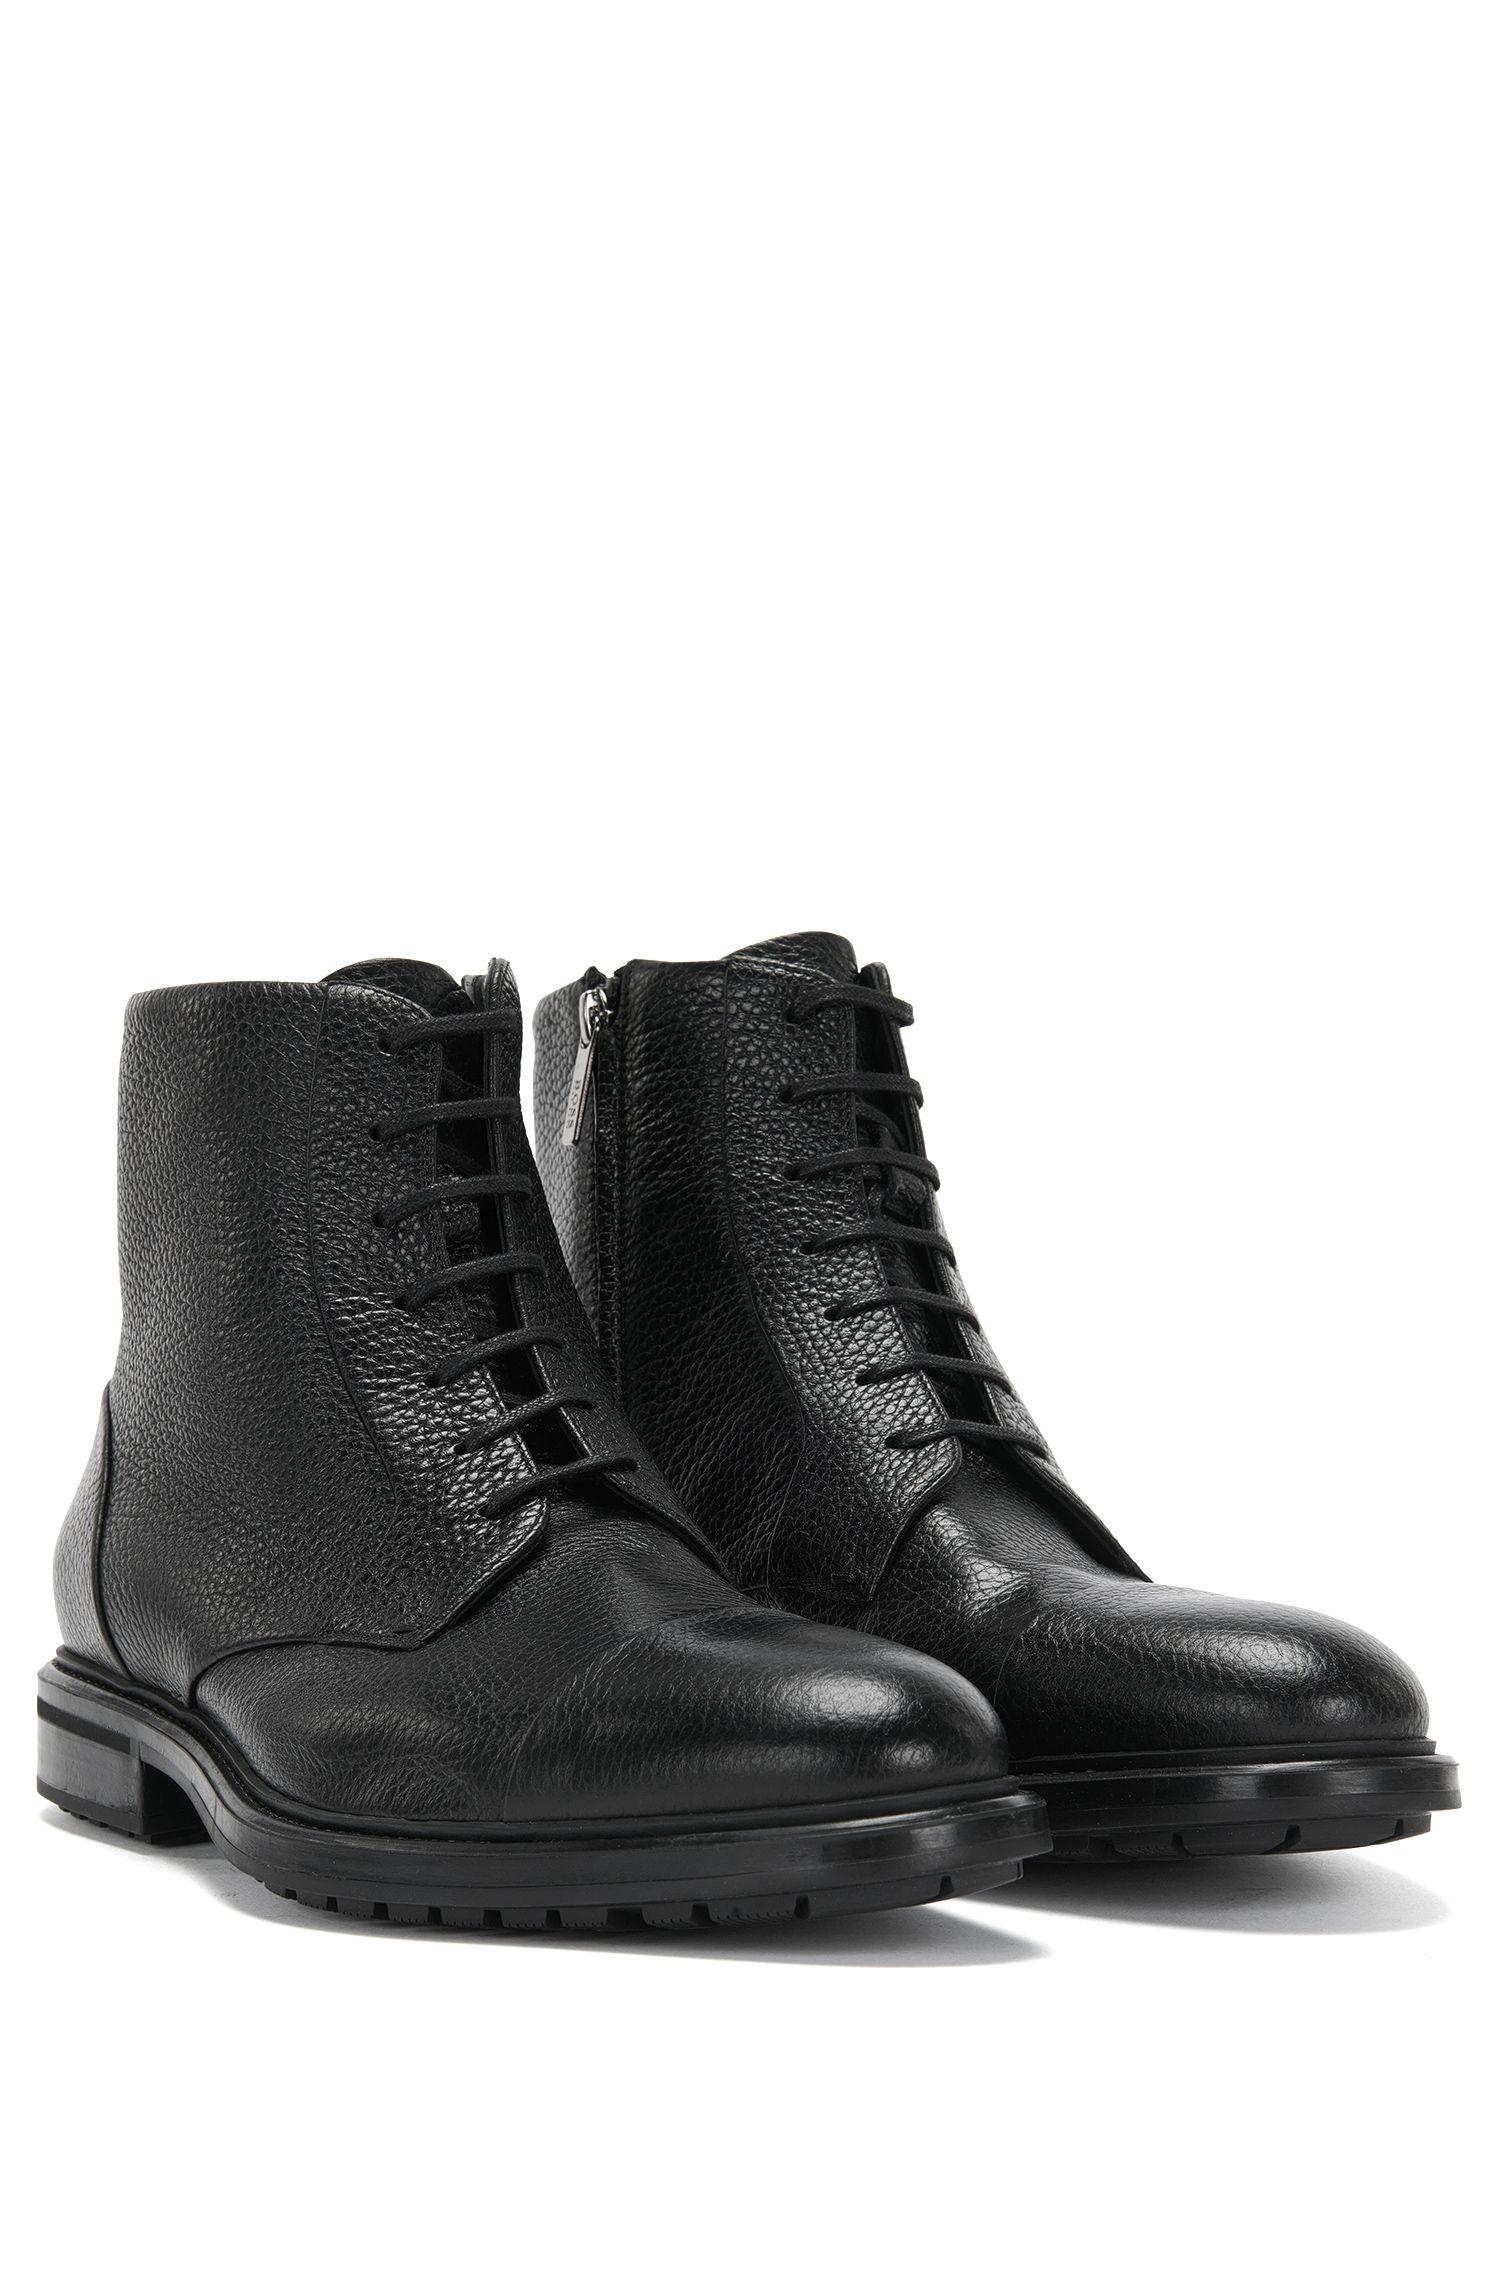 'Warsaw Halb Grct' | Grained Calfskin Work Boots